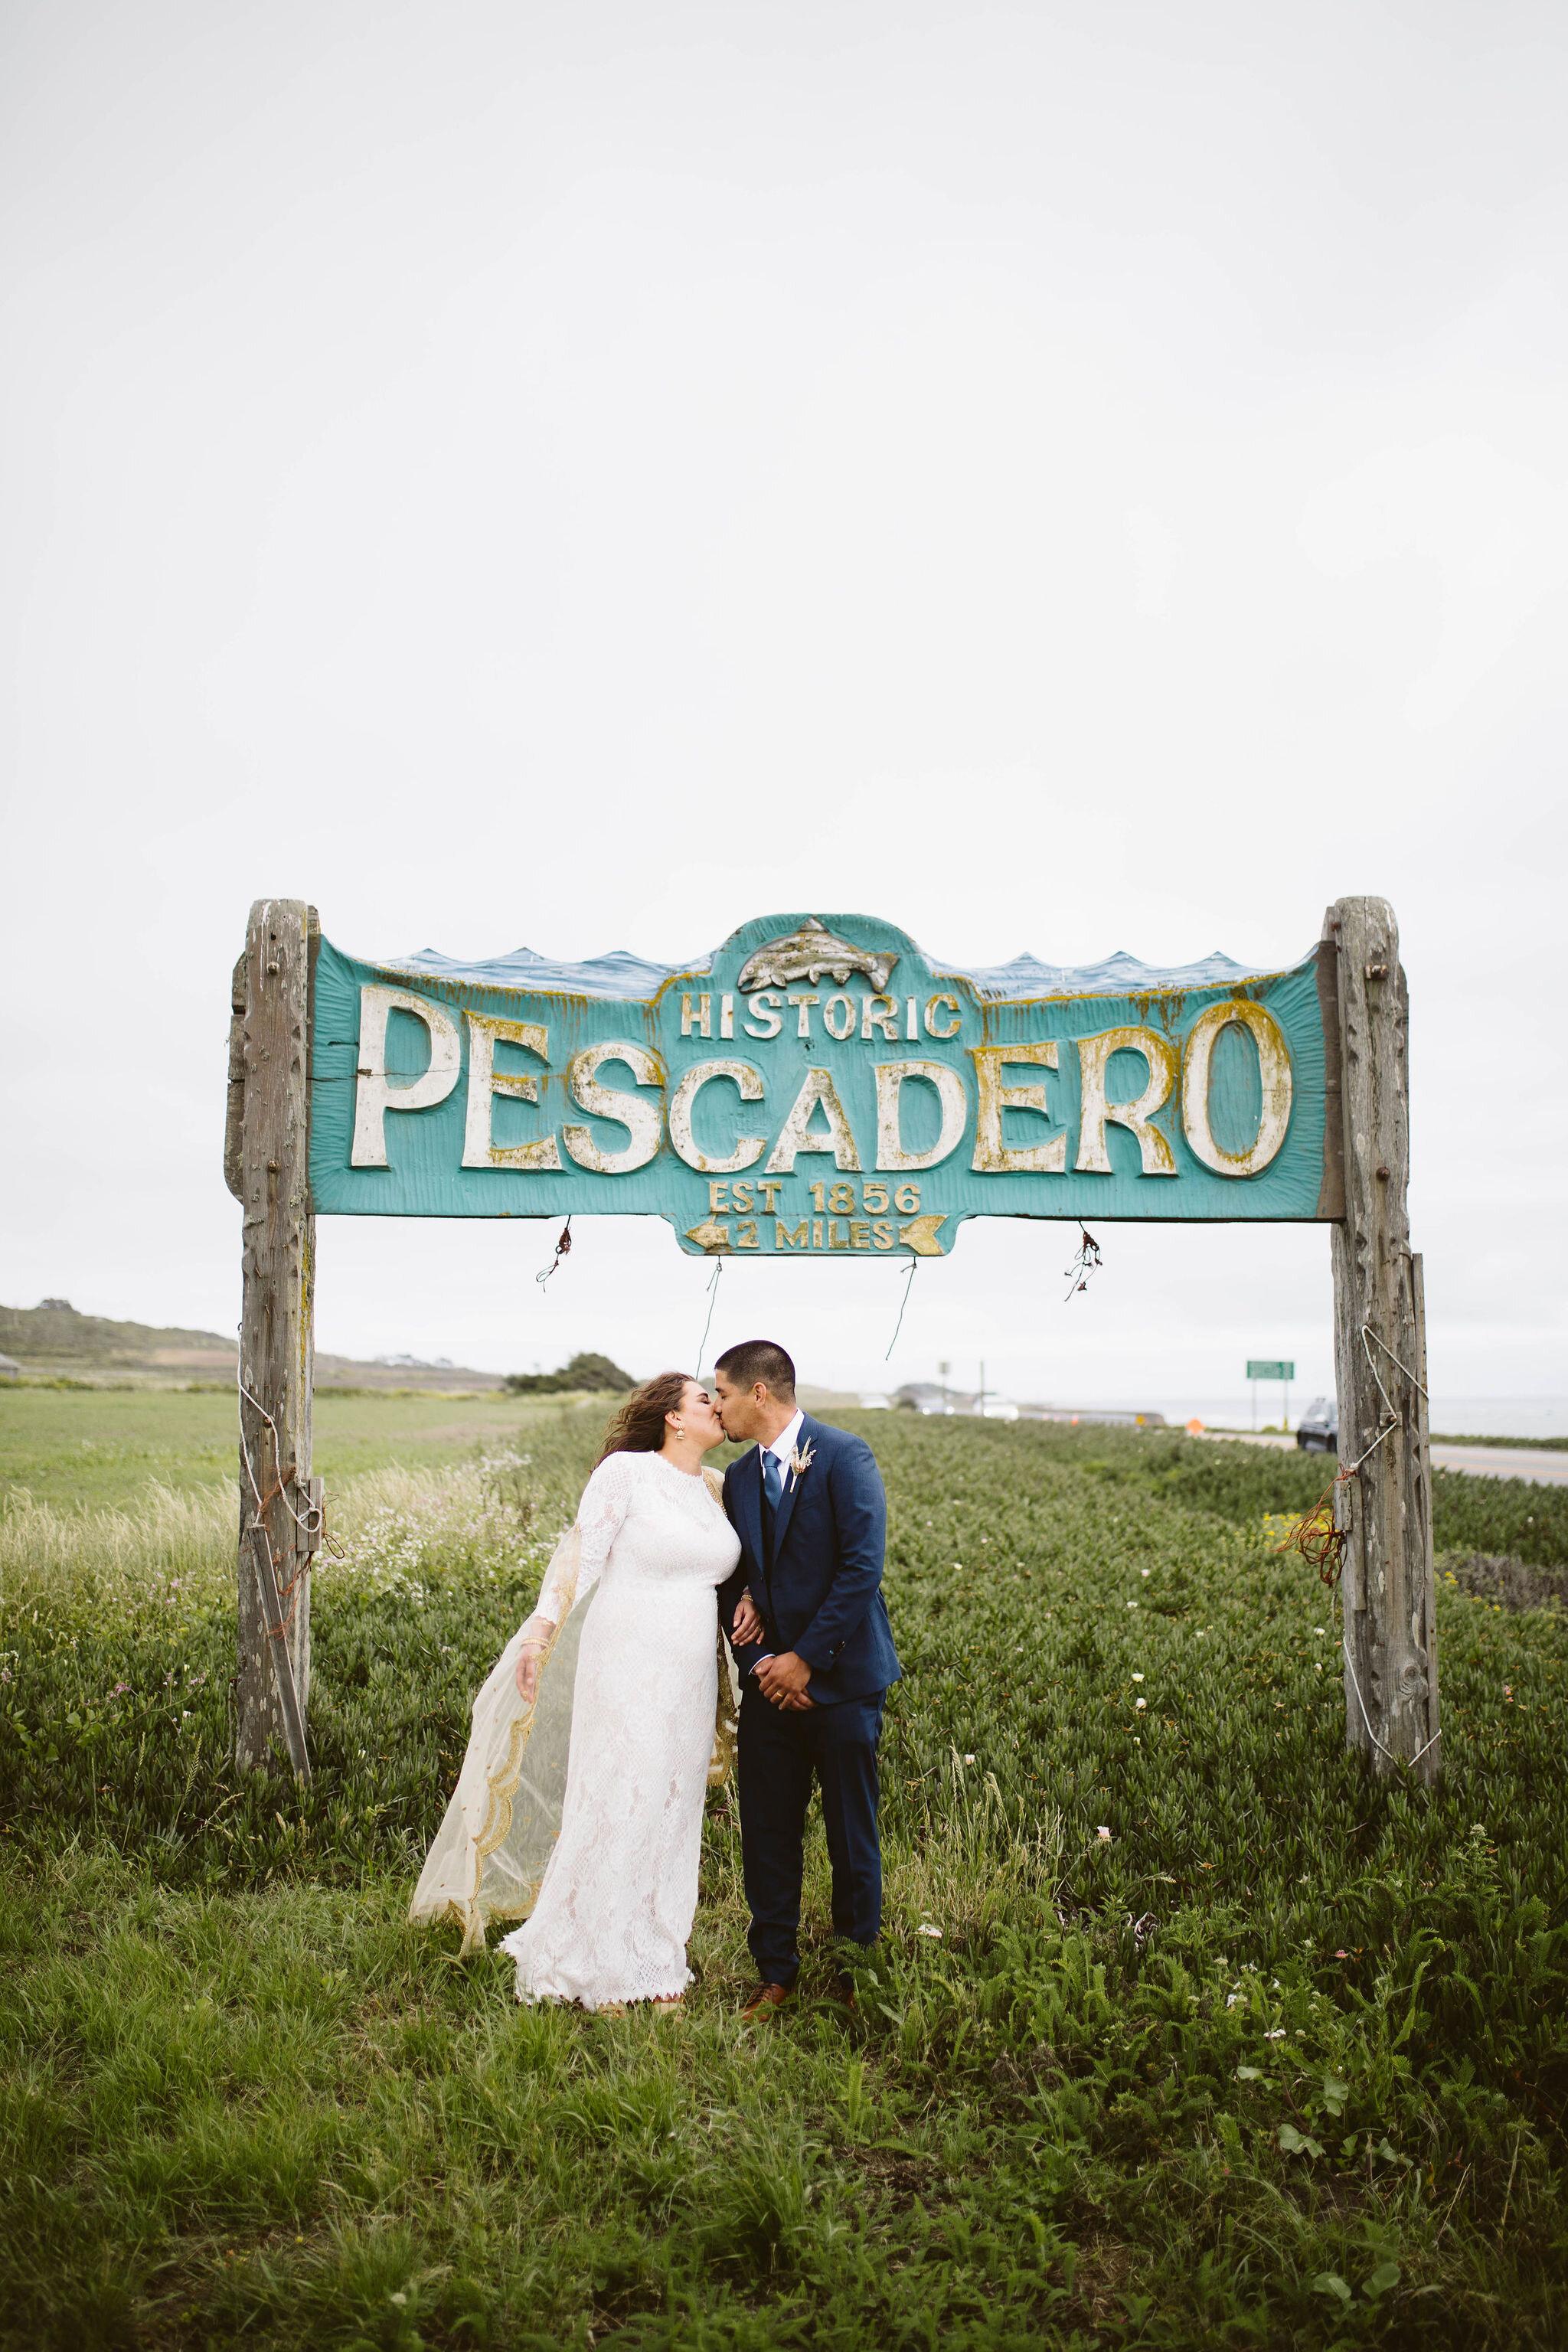 Venture-Retreat-Center-Wedding-Pescadero-Sat-Aaron-Pritam-The-Shalom-Imaginative-409.jpg